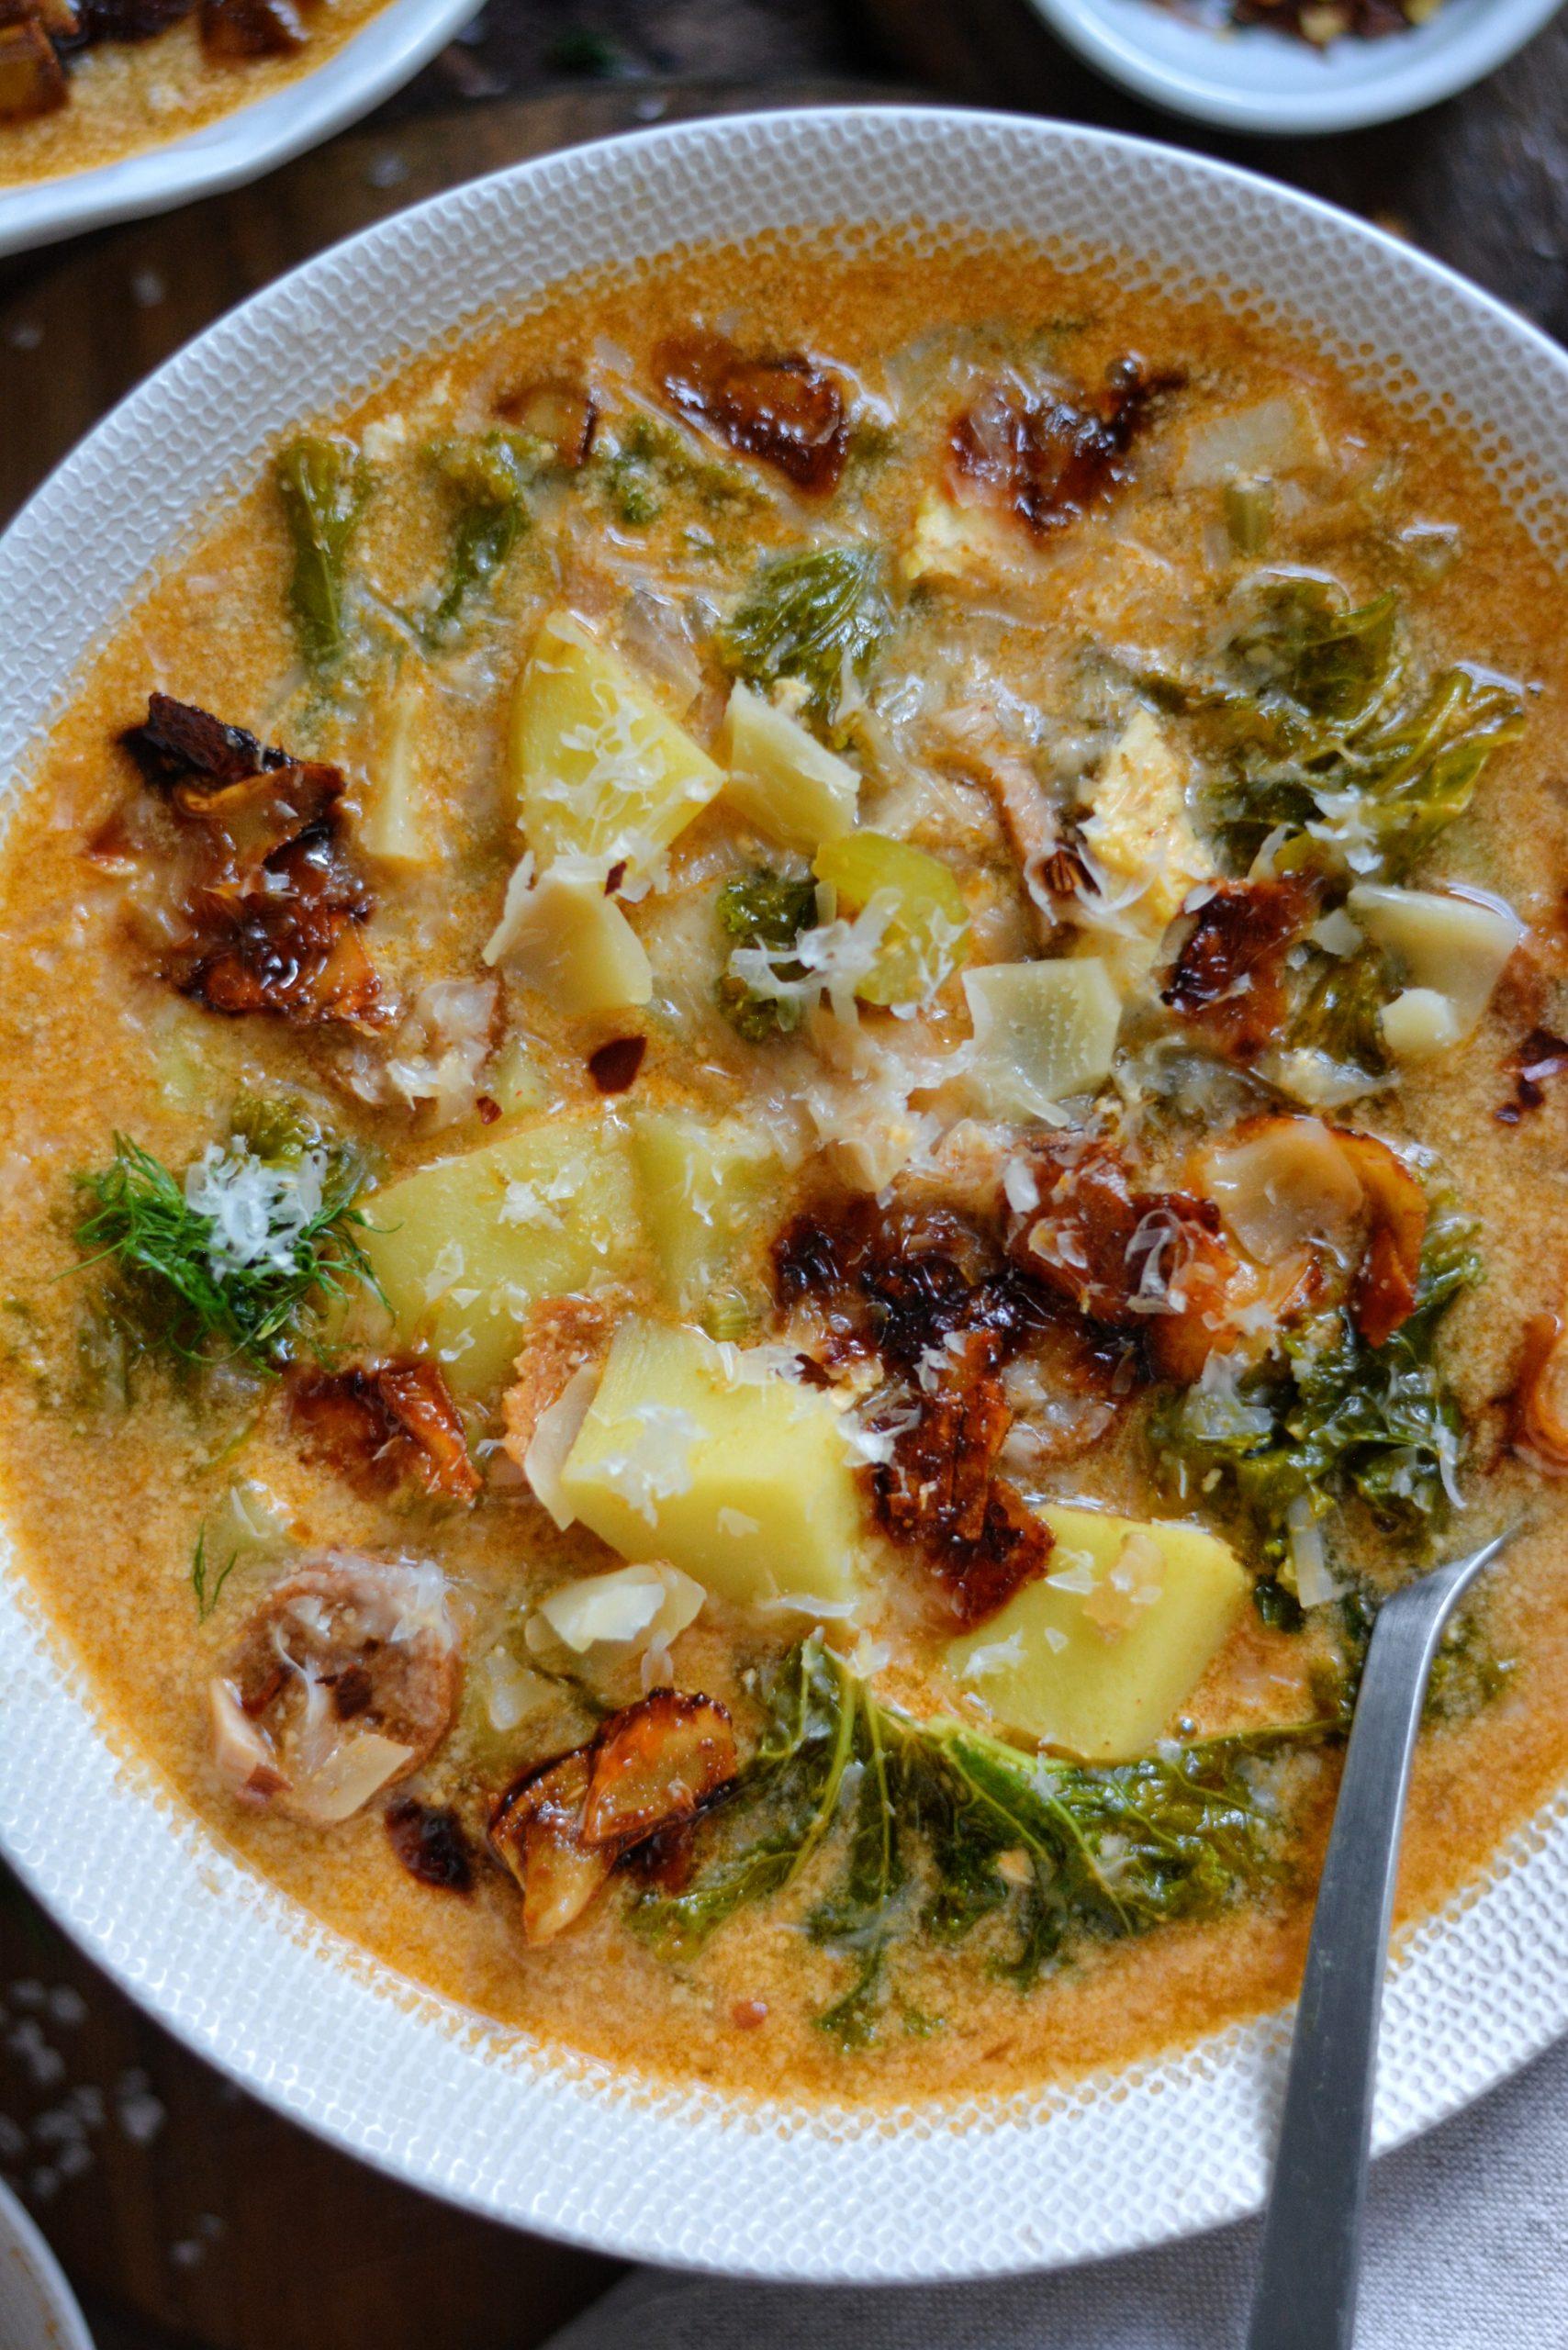 Soupe Toscane Vegan au Kale et Bacon / Vegan Kale and Bacon Zuppa Toscana